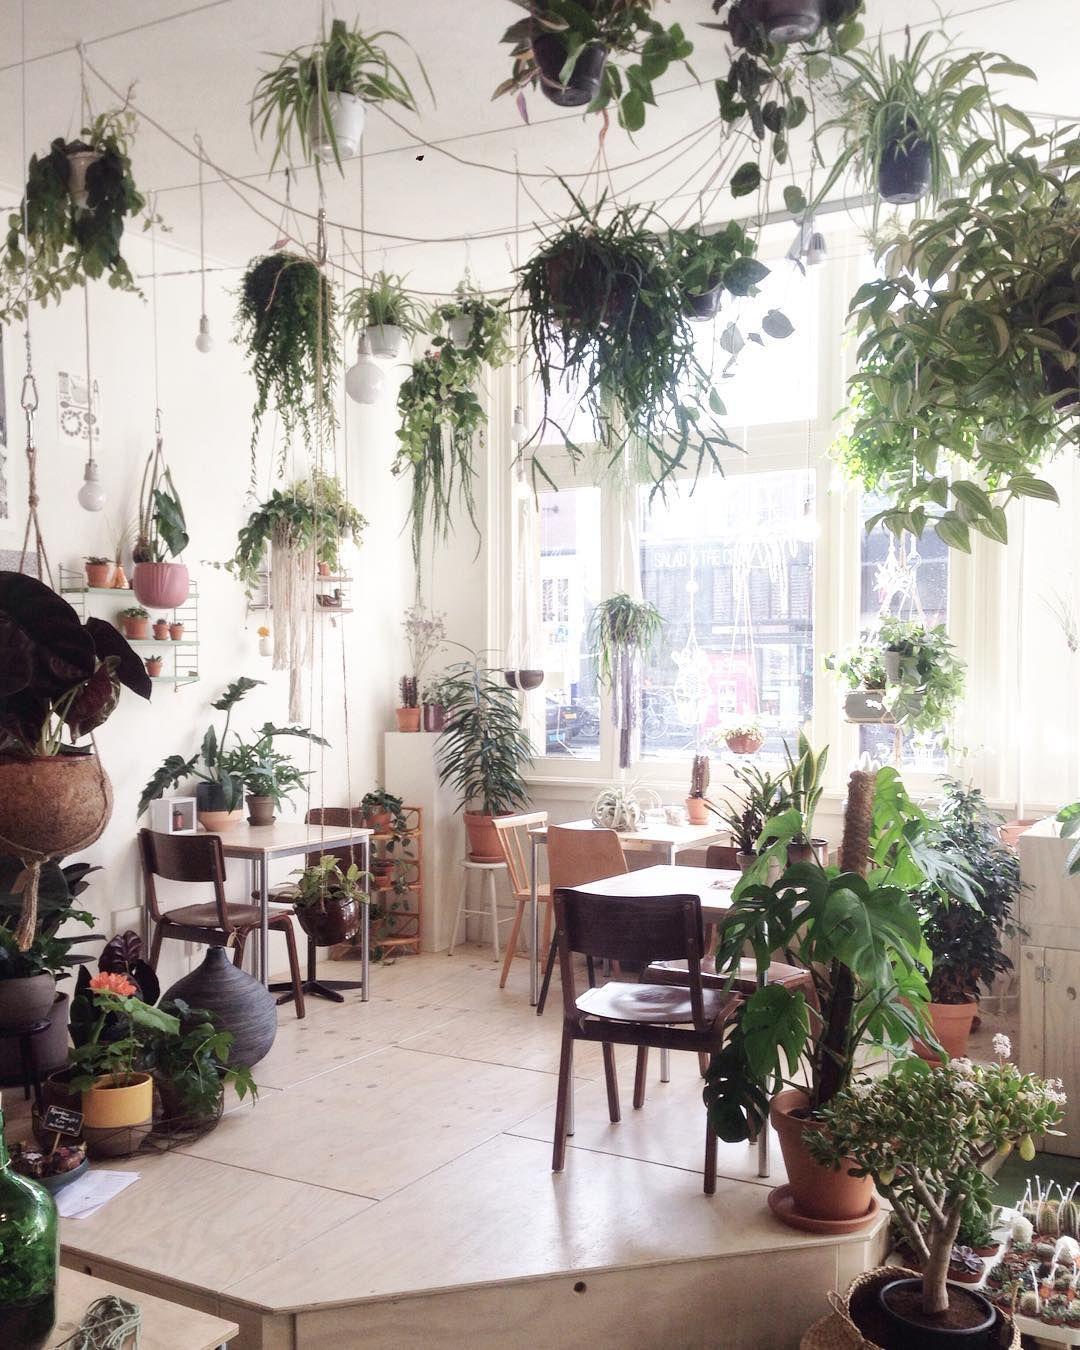 Pin von Tatiana Orbu auf Houseplants / Растения в интерьере ...